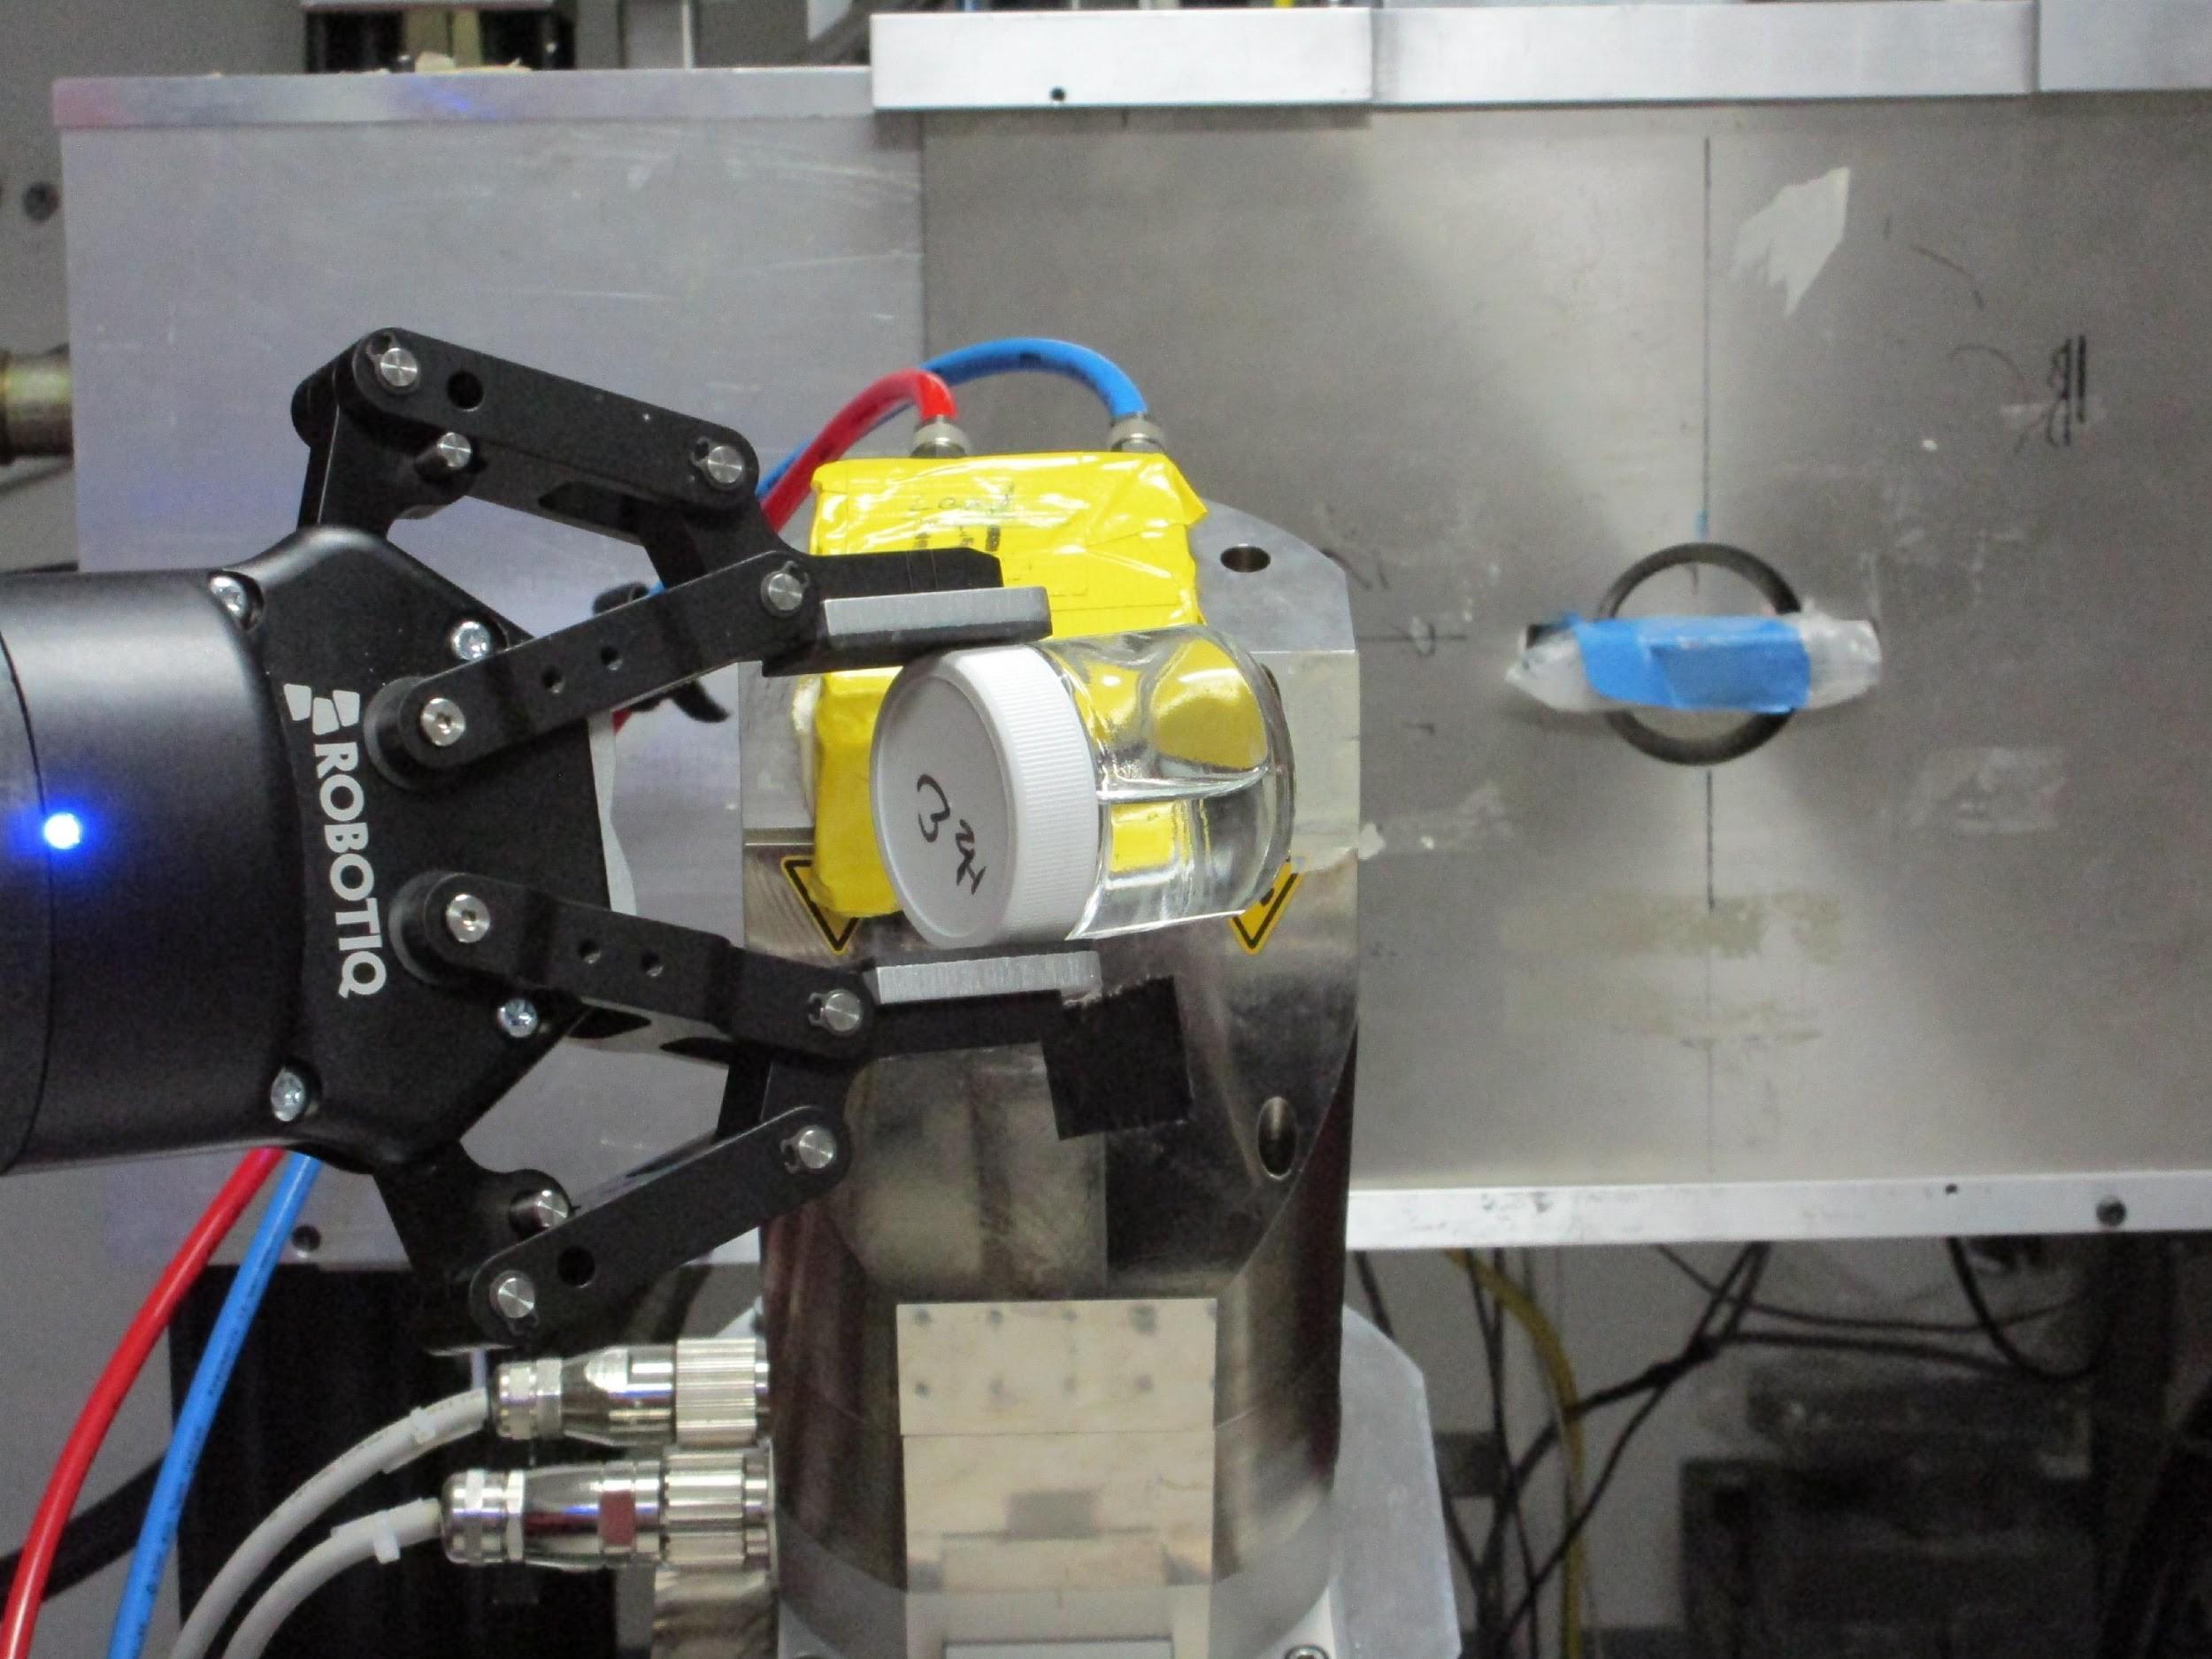 Robotiq 2-Finger Gripper Handles Radiated Parts at Los Alamos National Laboratory